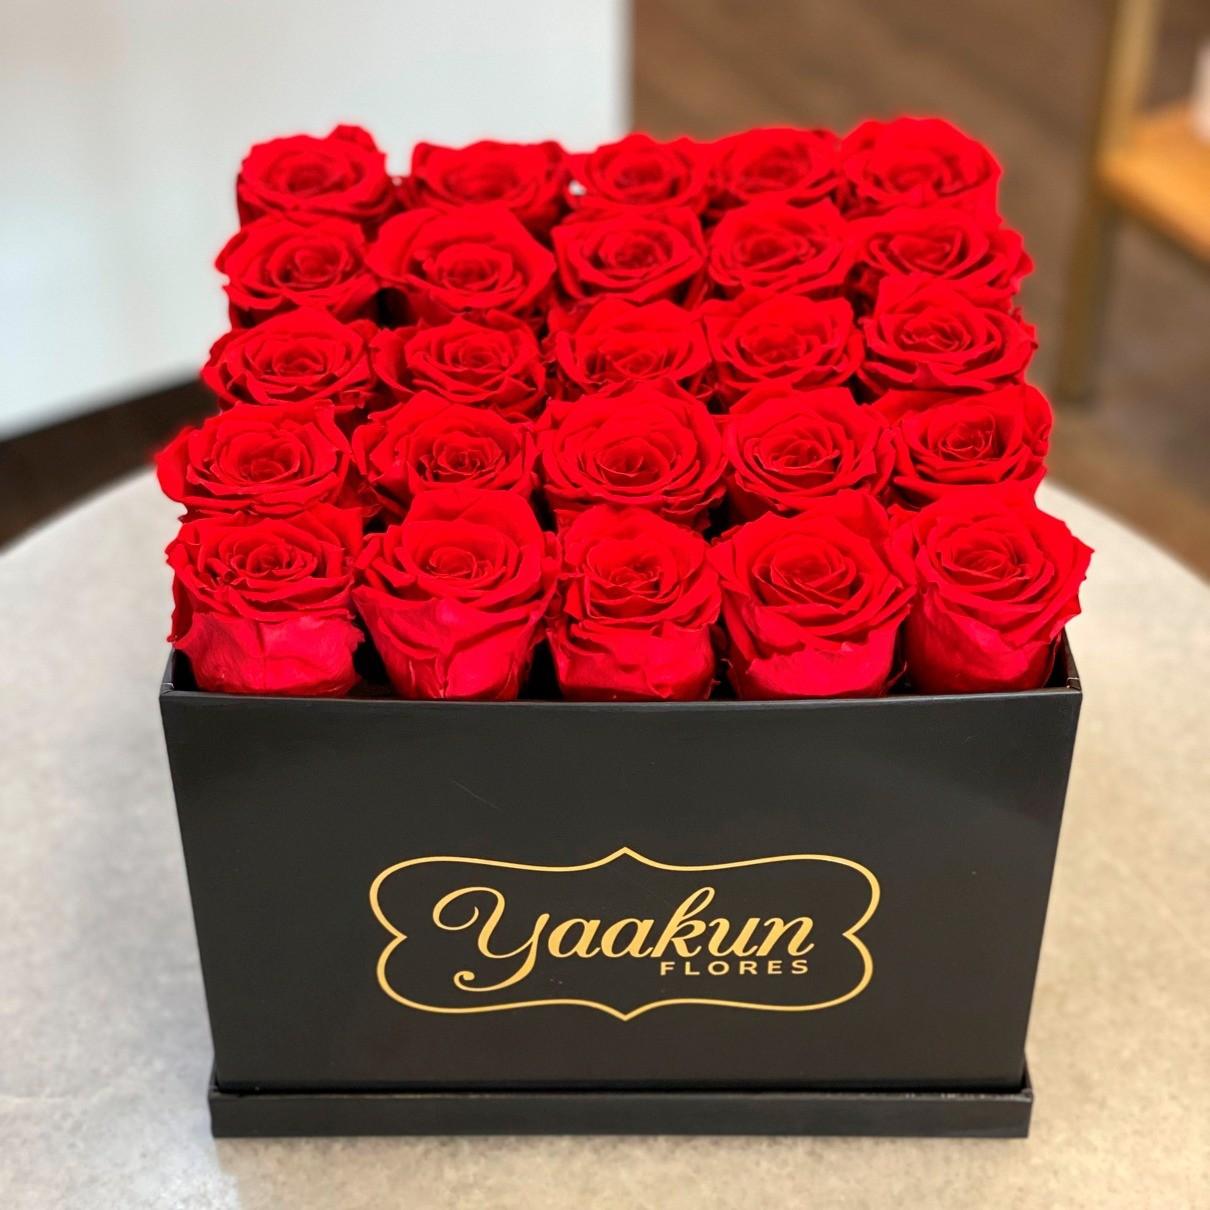 Rosas eternas en caja negra cuadrada rosas rojas